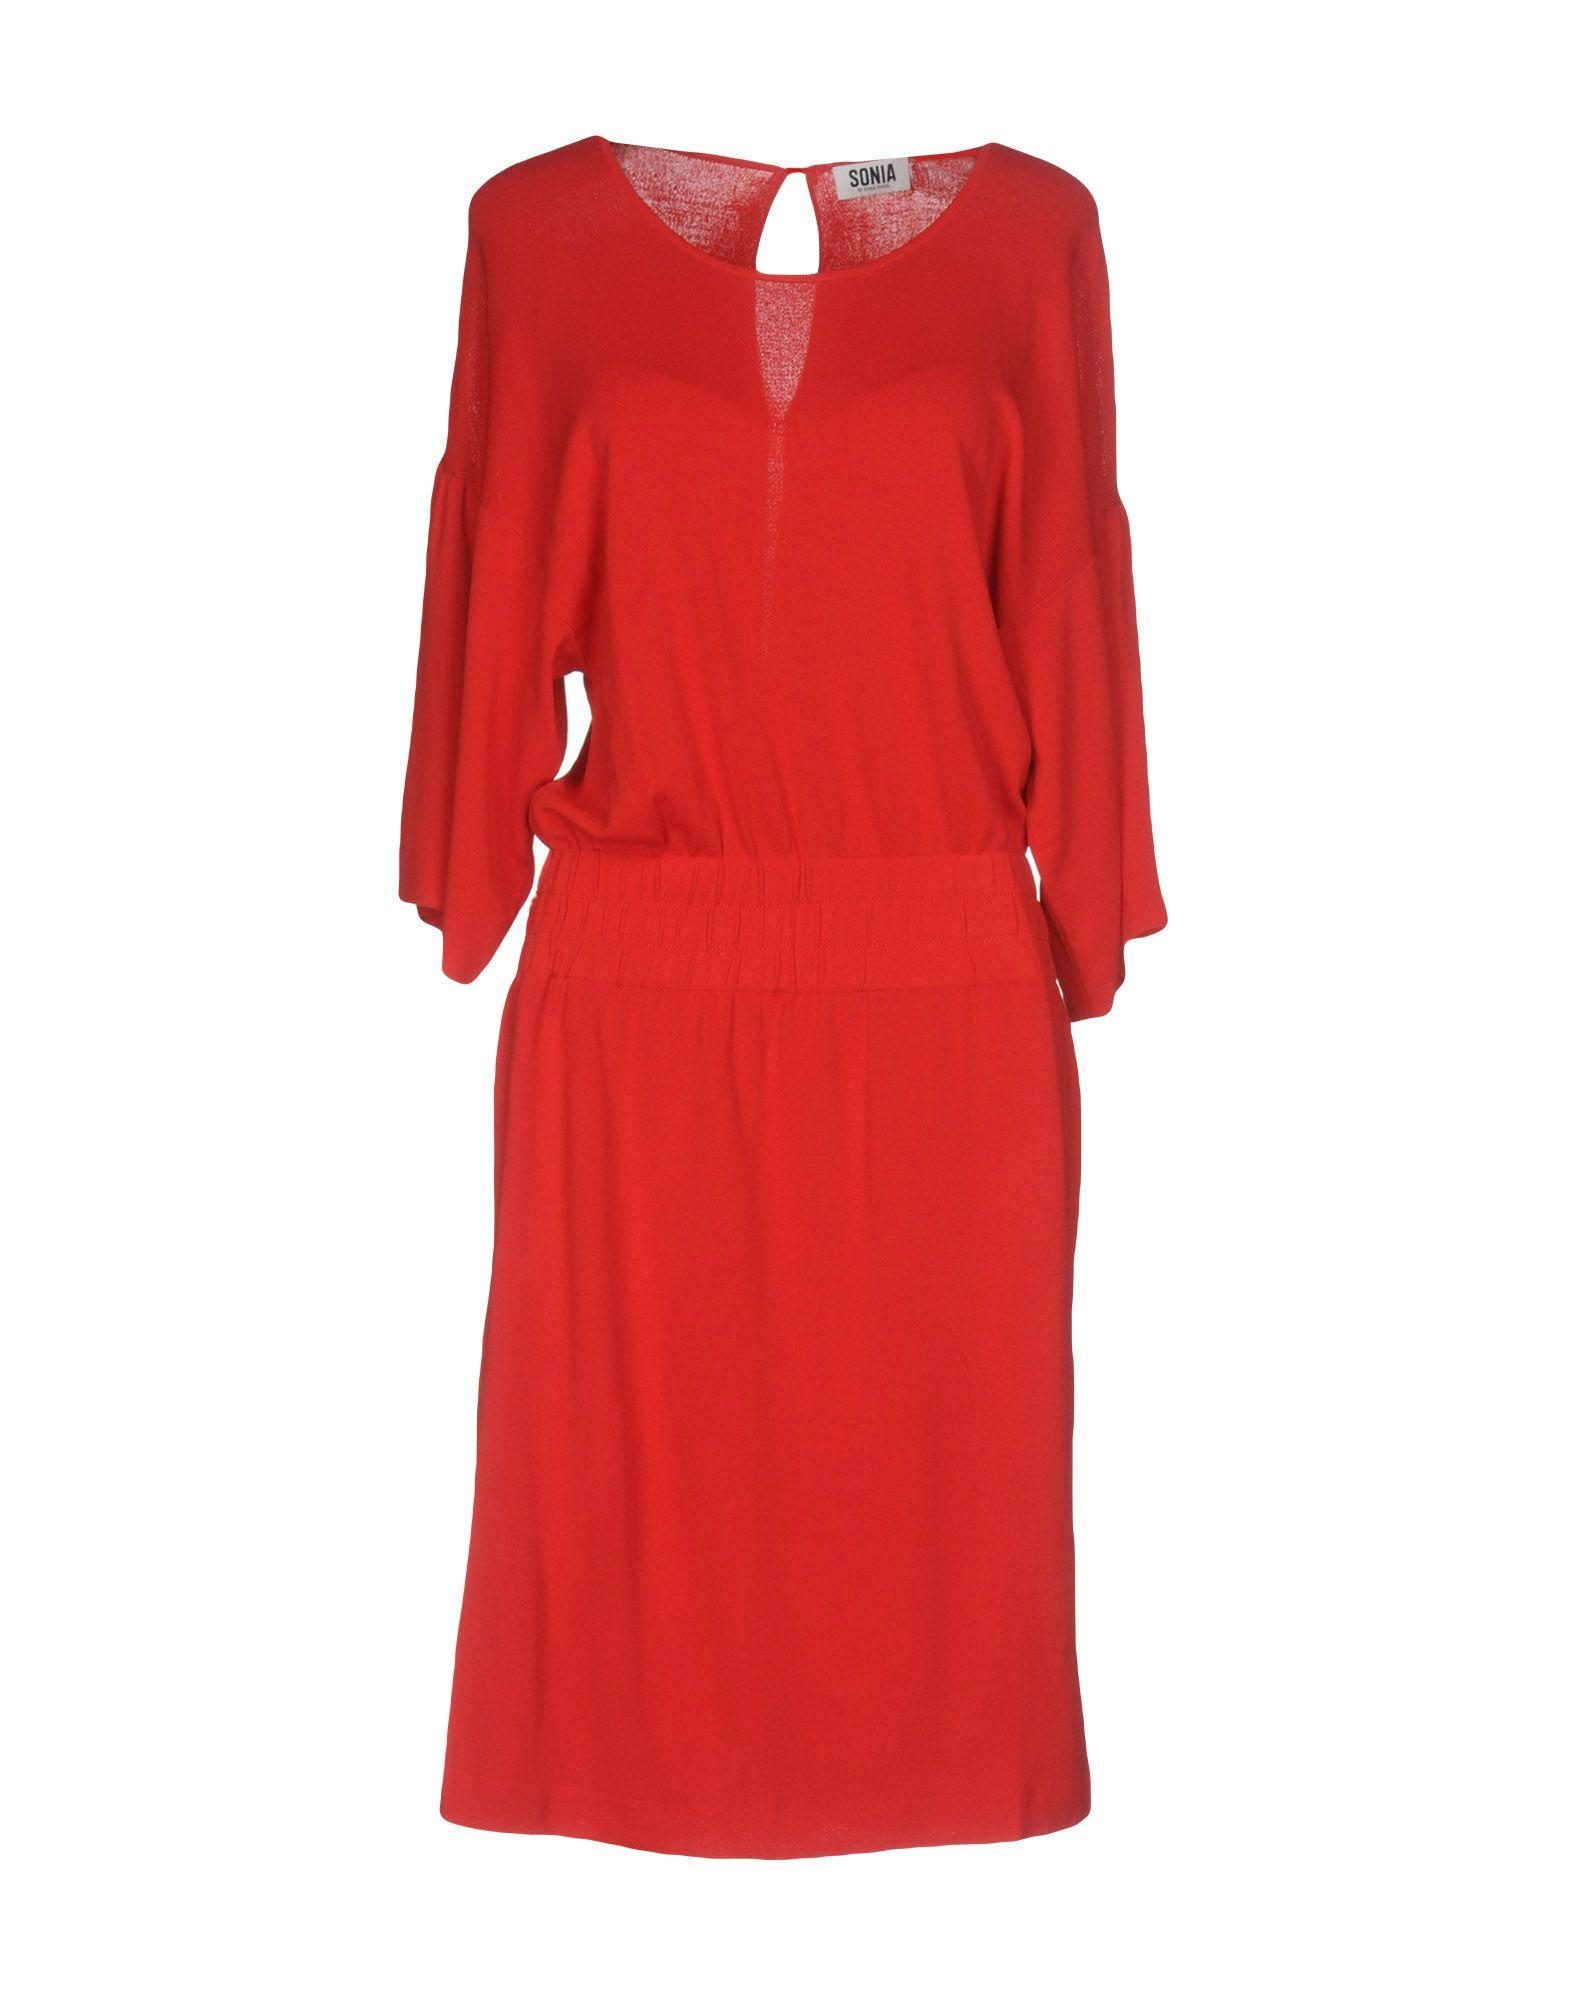 e4226de9c3be99 Sonia By Sonia Rykiel Knee-Length Dresses In Red